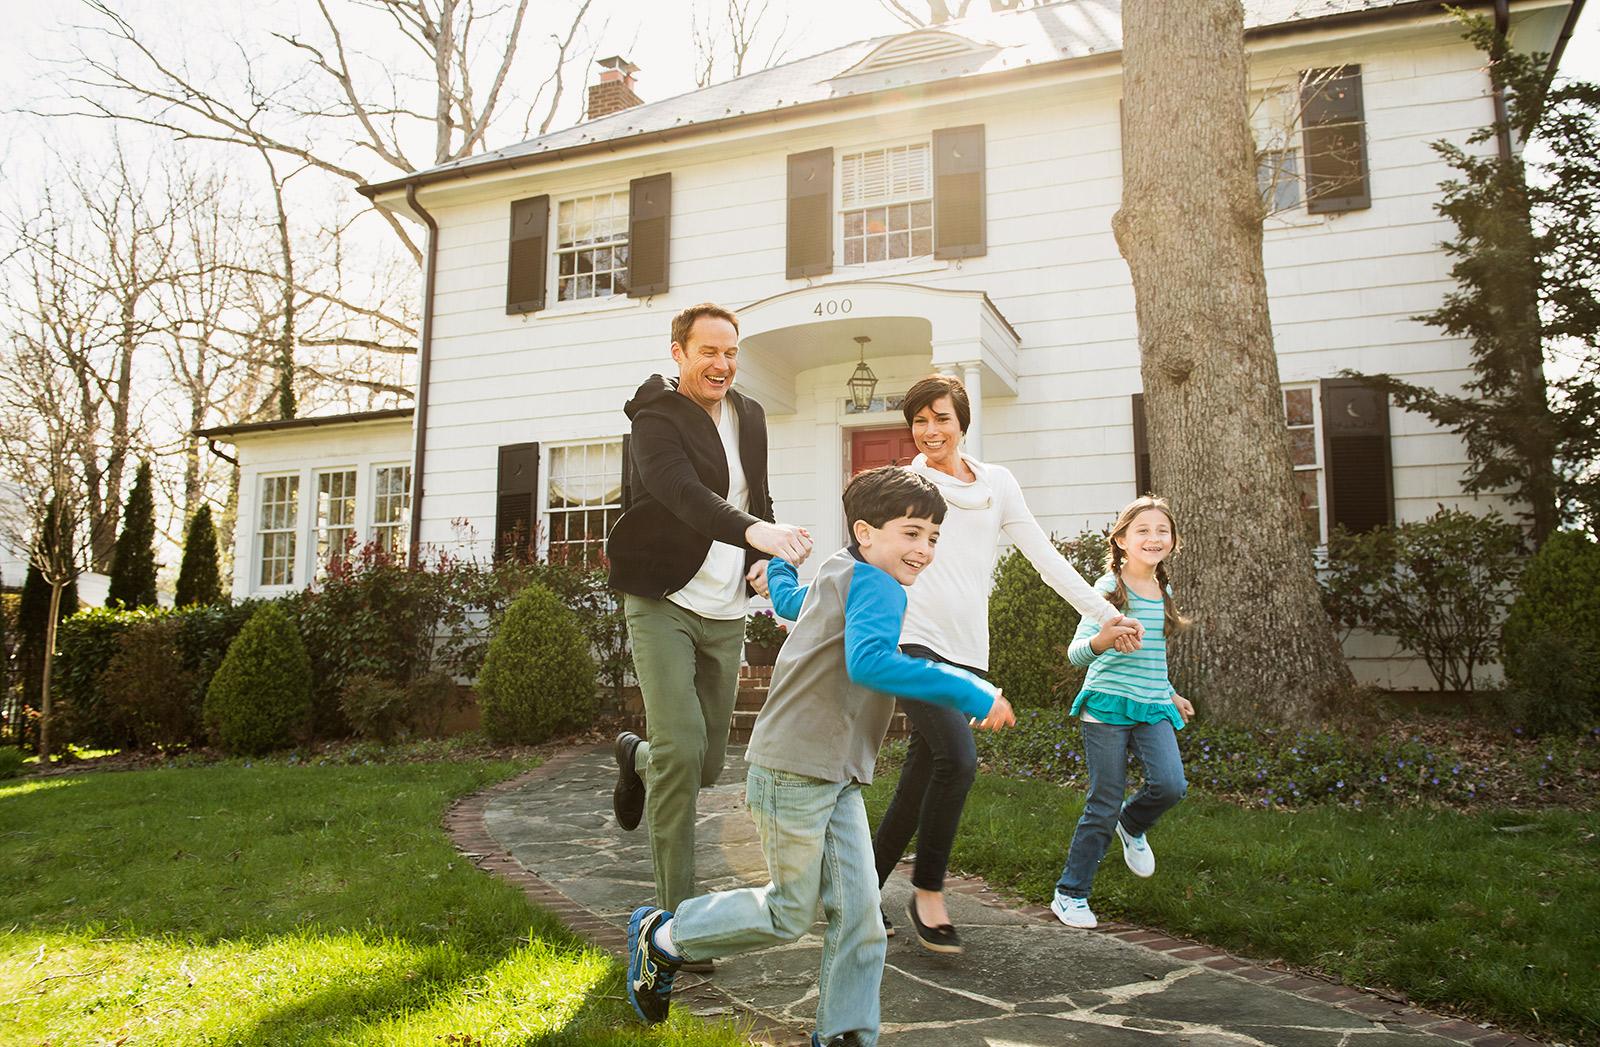 outside_house_family copy.jpg